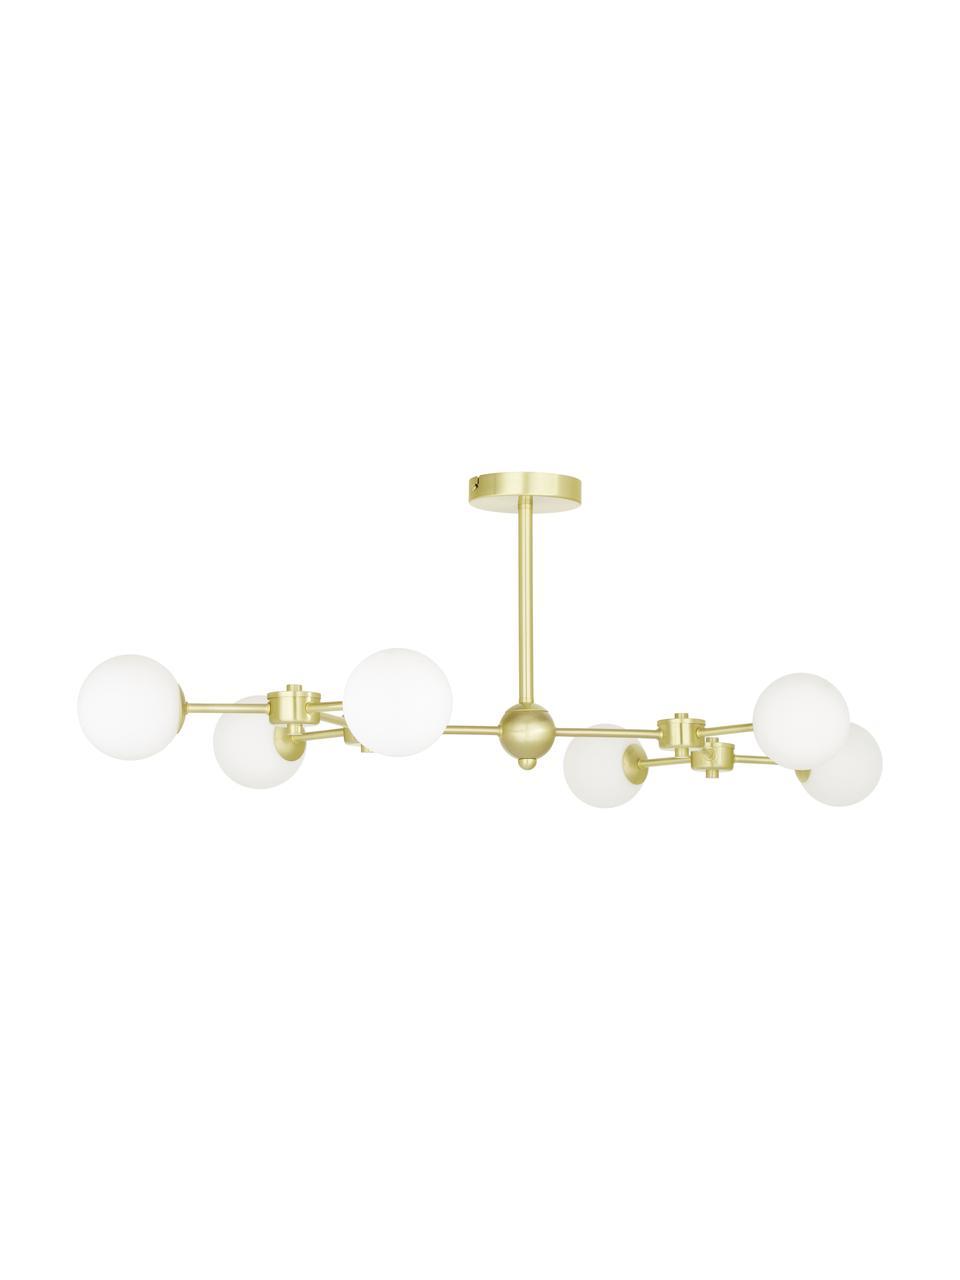 Lampada da soffitto dorata Aurelia, Paralume: vetro, Bianco, ottone, Ø 110 x Alt. 32 cm